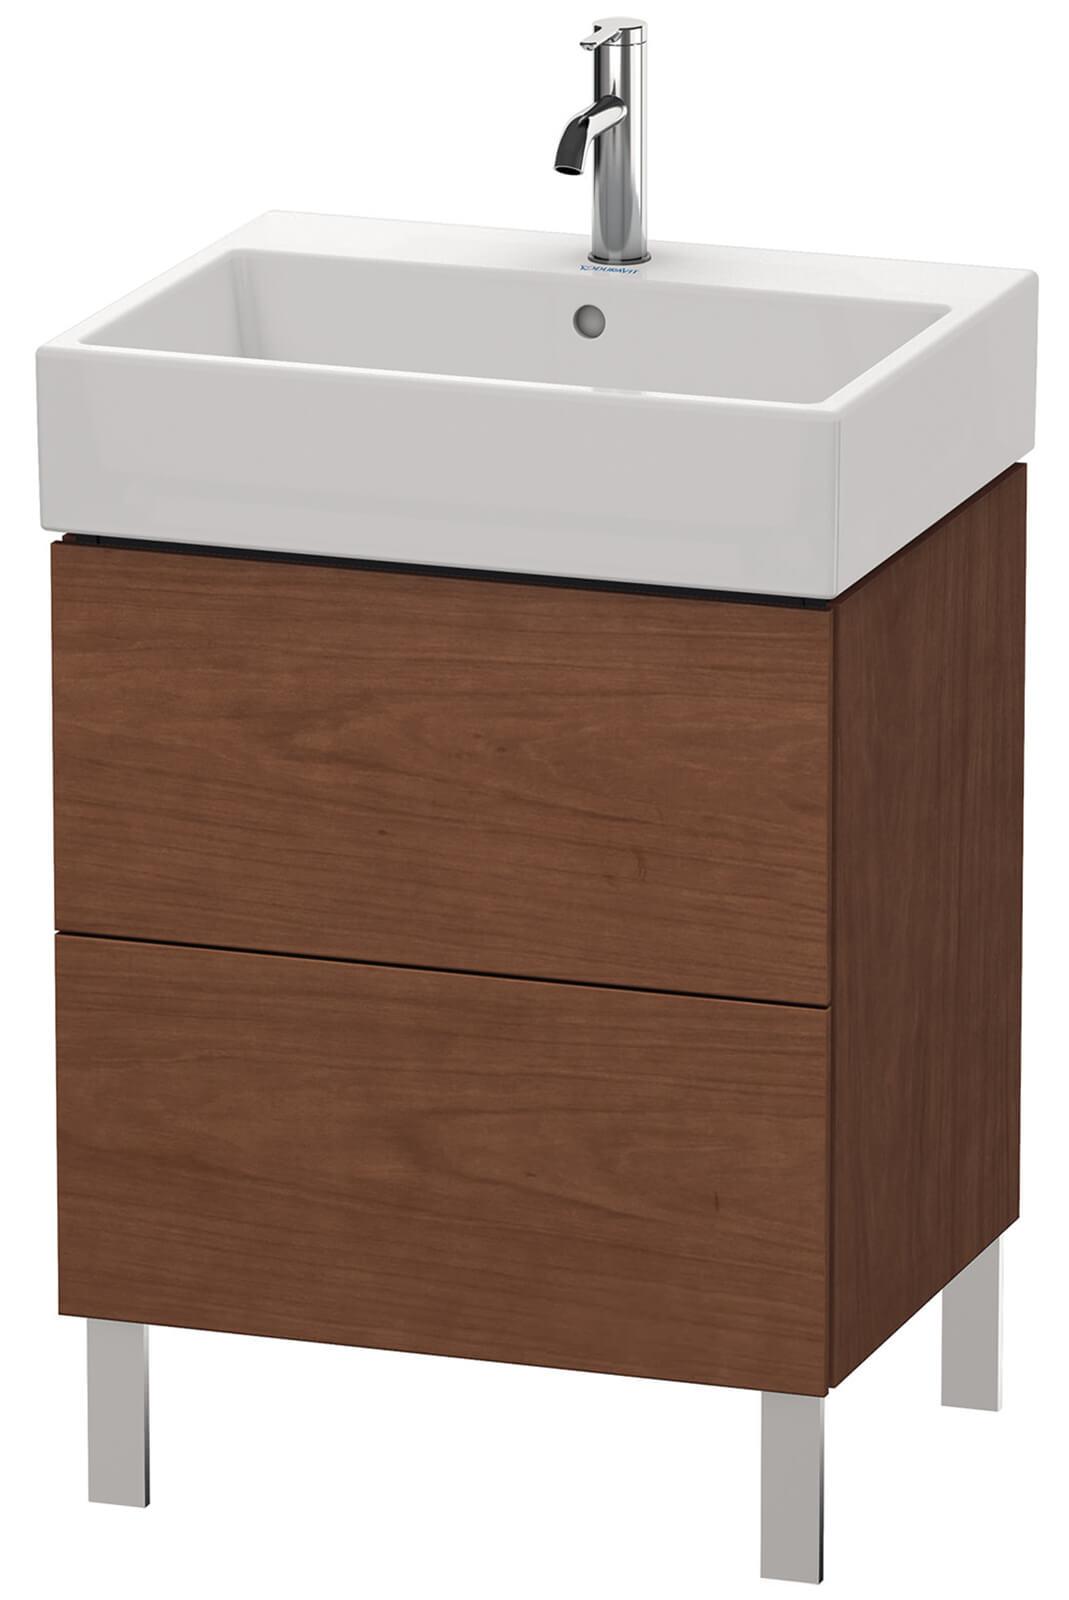 duravit l cube 584mm floor standing vanity unit with vero air basin. Black Bedroom Furniture Sets. Home Design Ideas